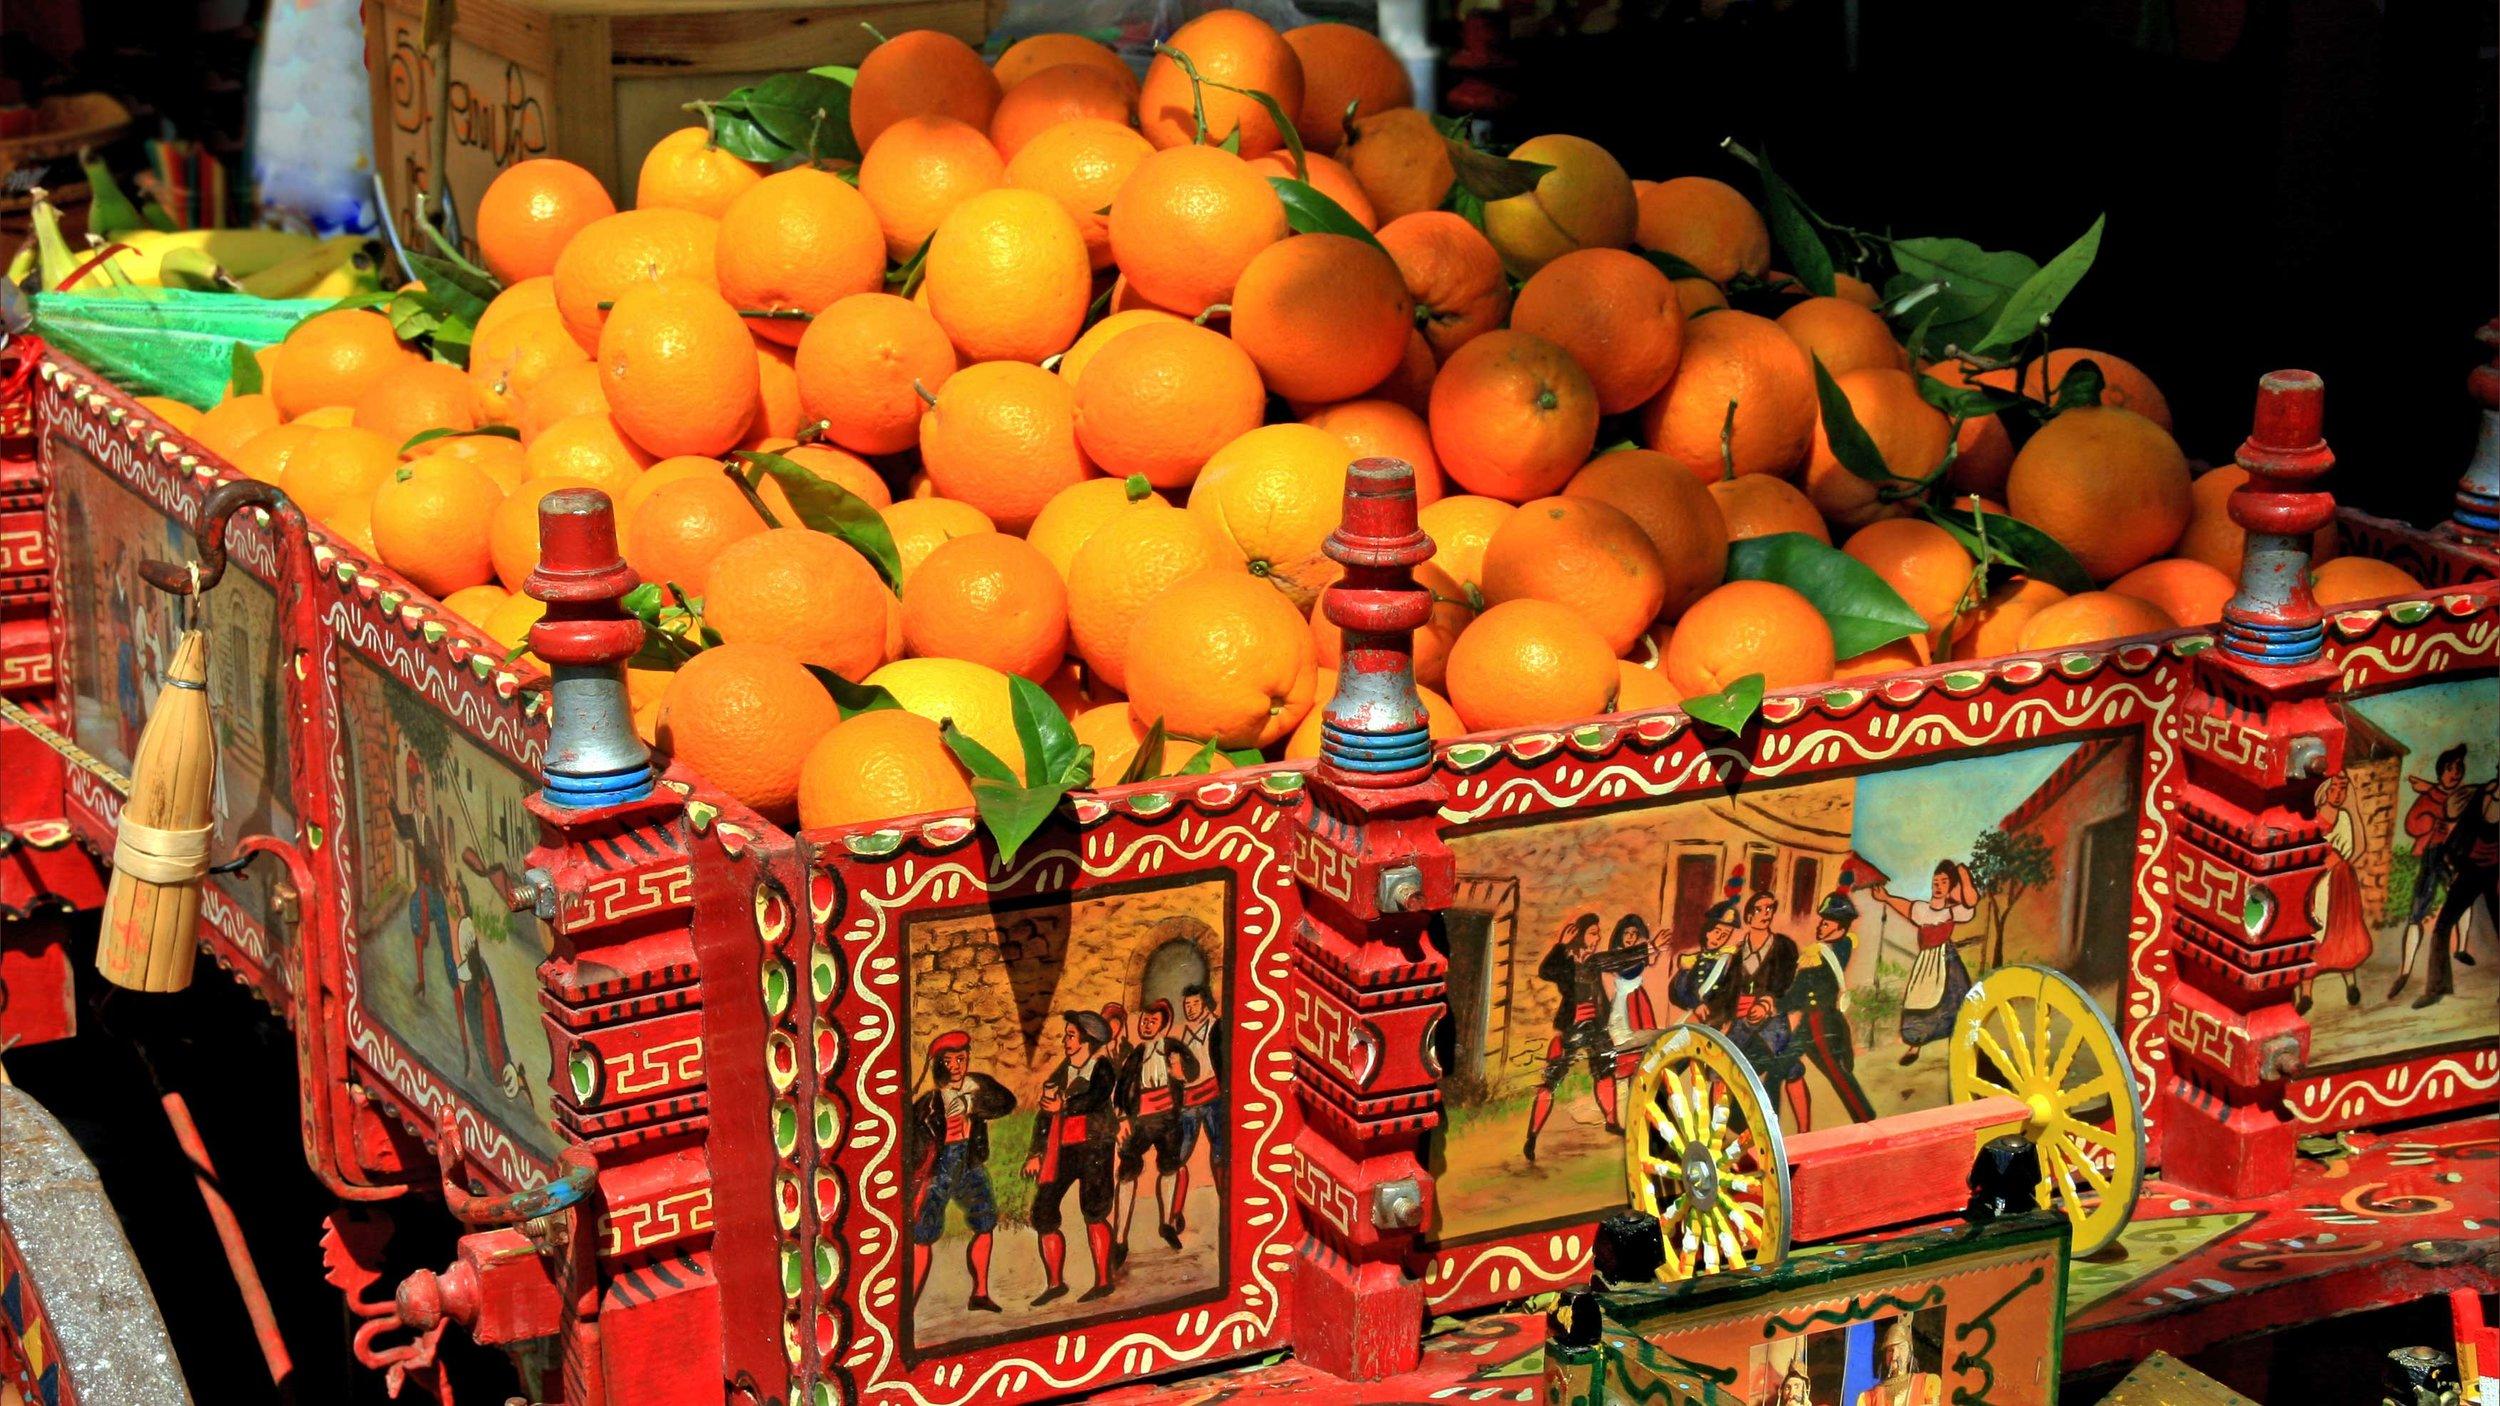 Orange-Sicily---Jidlo-Sicilie.jpg